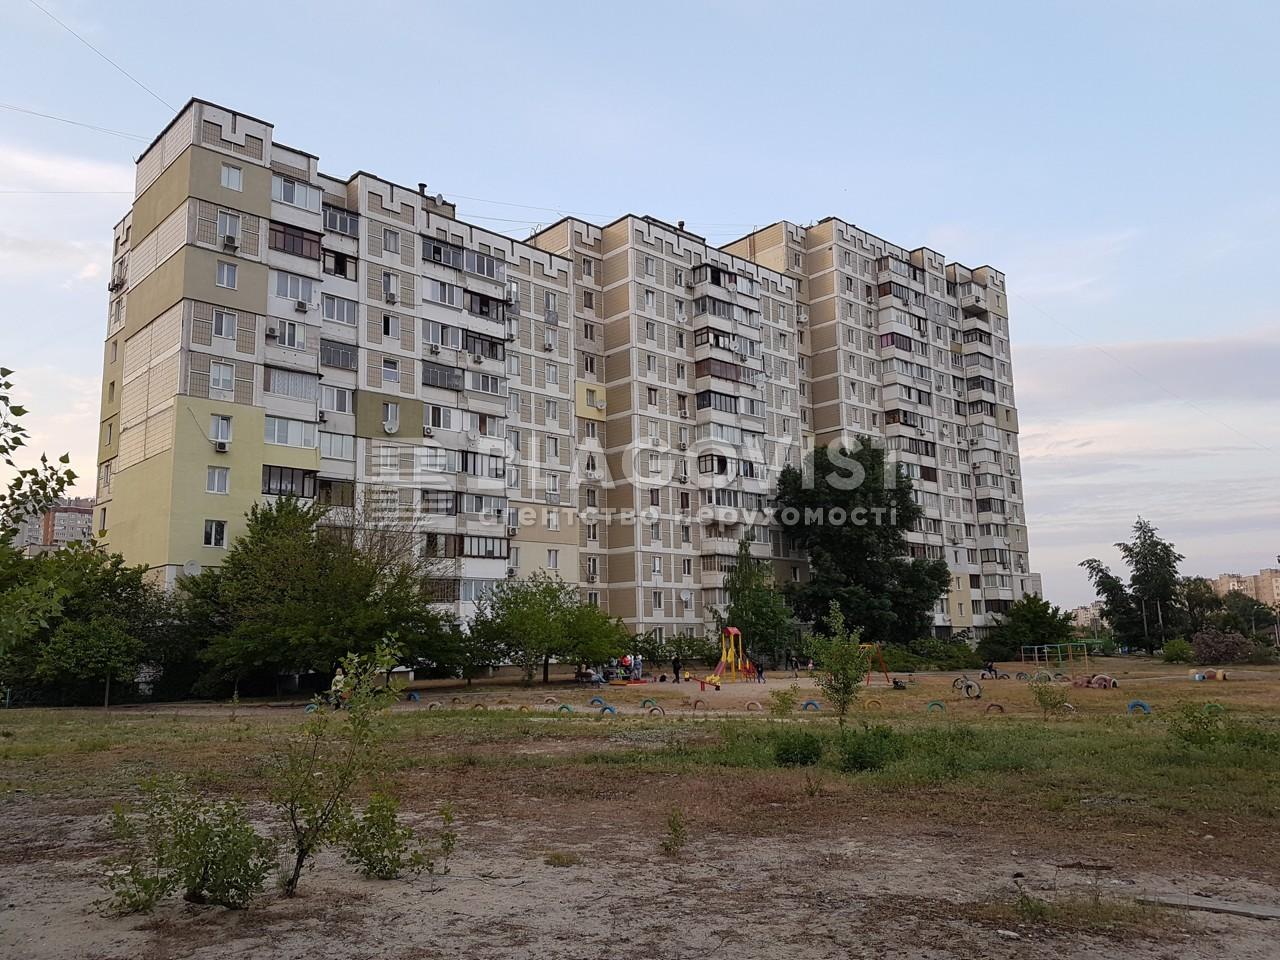 Квартира C-104323, Бальзака Оноре де, 55, Киев - Фото 2